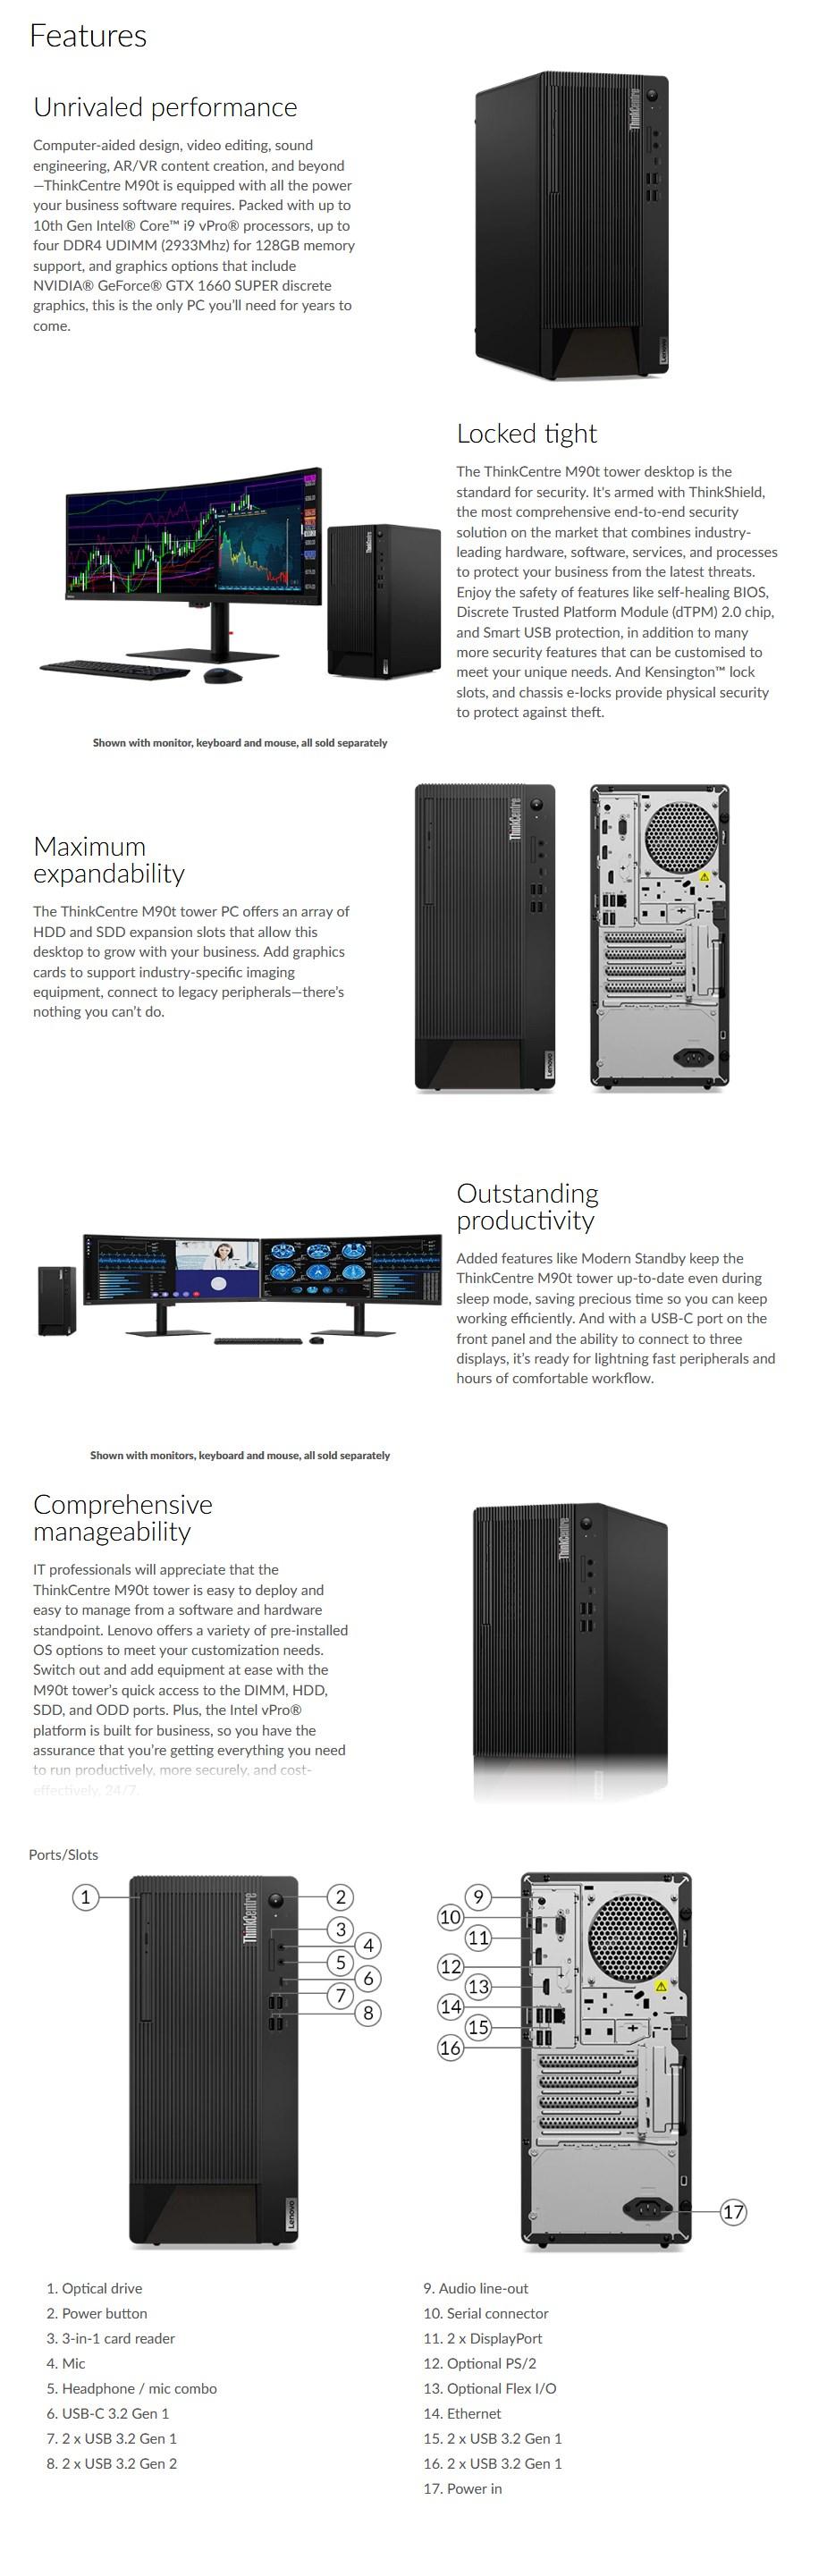 lenovo-m90t-tower-desktop-i710700-16gb-2x512gb-windows-10-pro-ac41132-6-1-.jpg